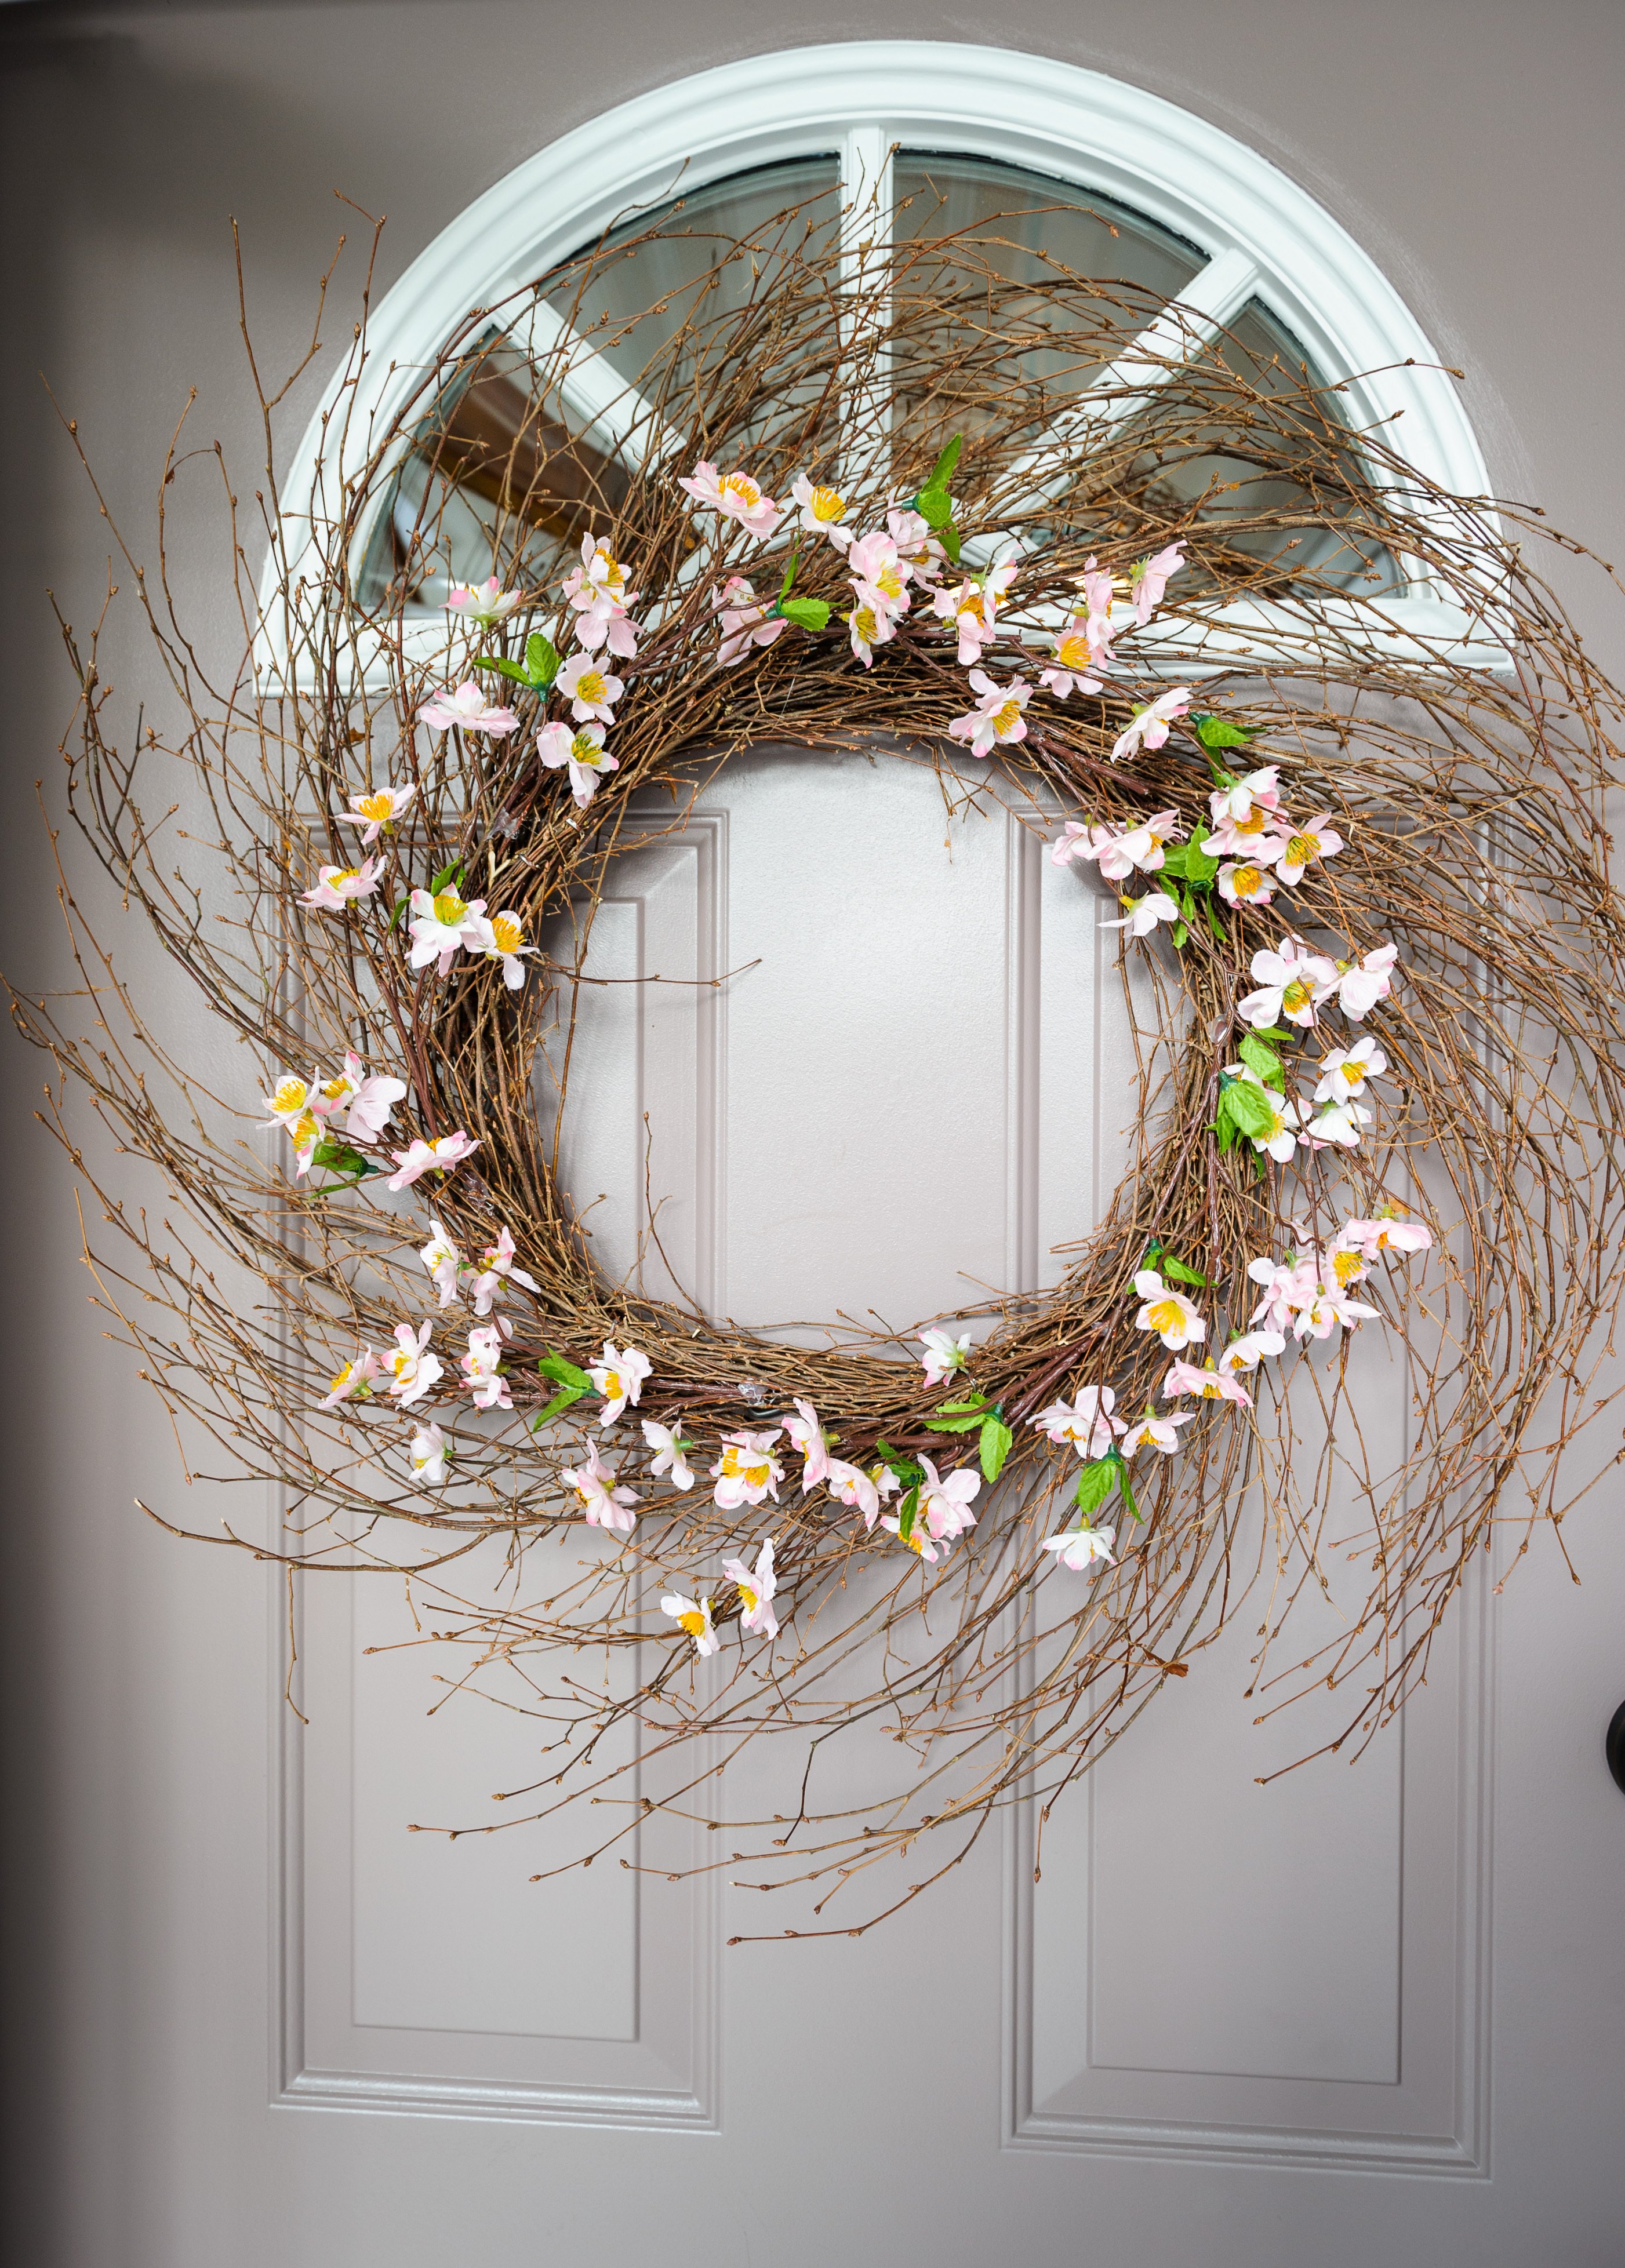 Easter | Spring | Easter Wreath | Spring Wreath | Easter Decor | Spring Decor | Wreath